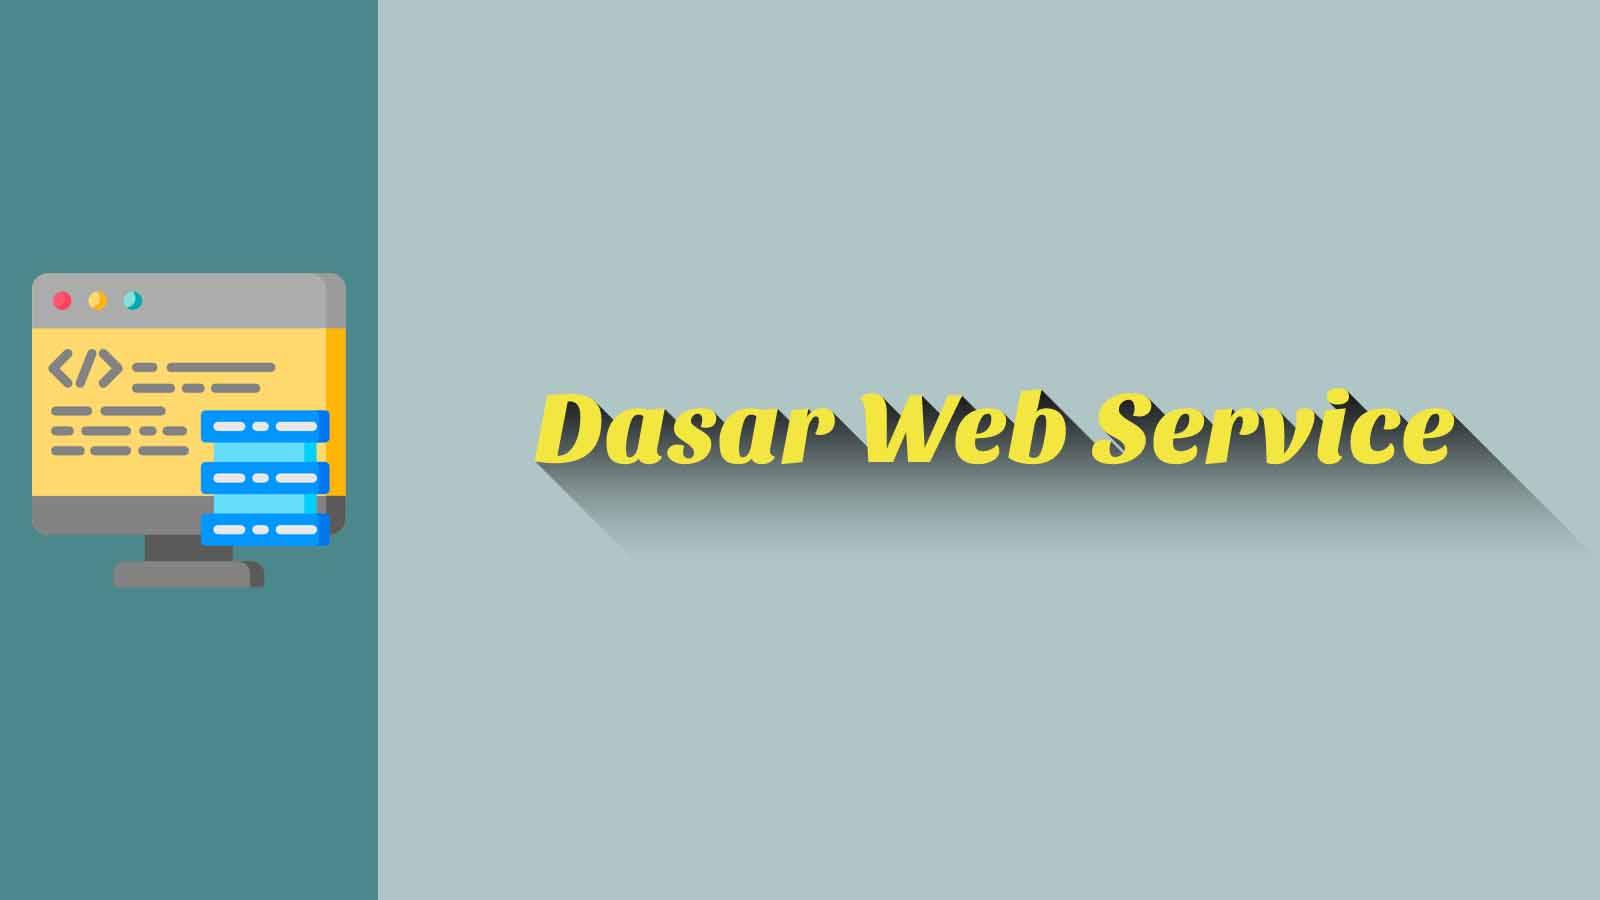 Dasar Web Service